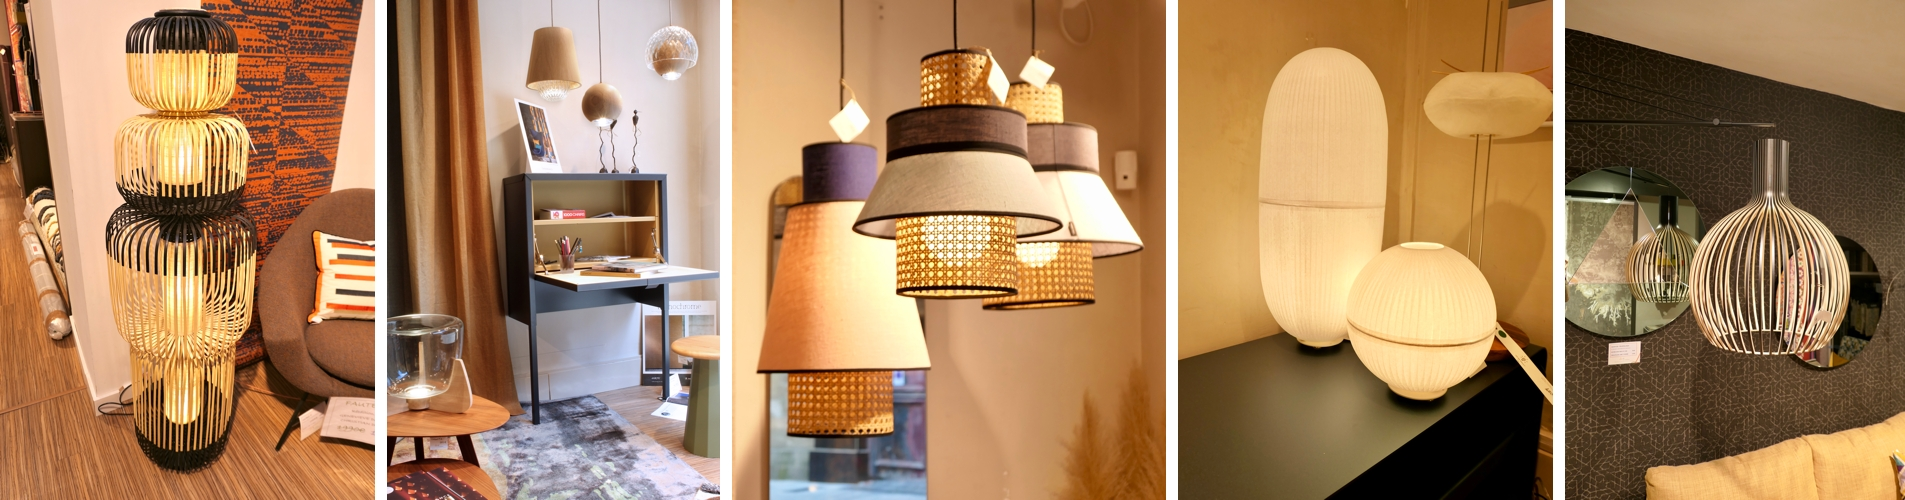 LUMINAIRES Luminaires et éclairage IKEA IKEA